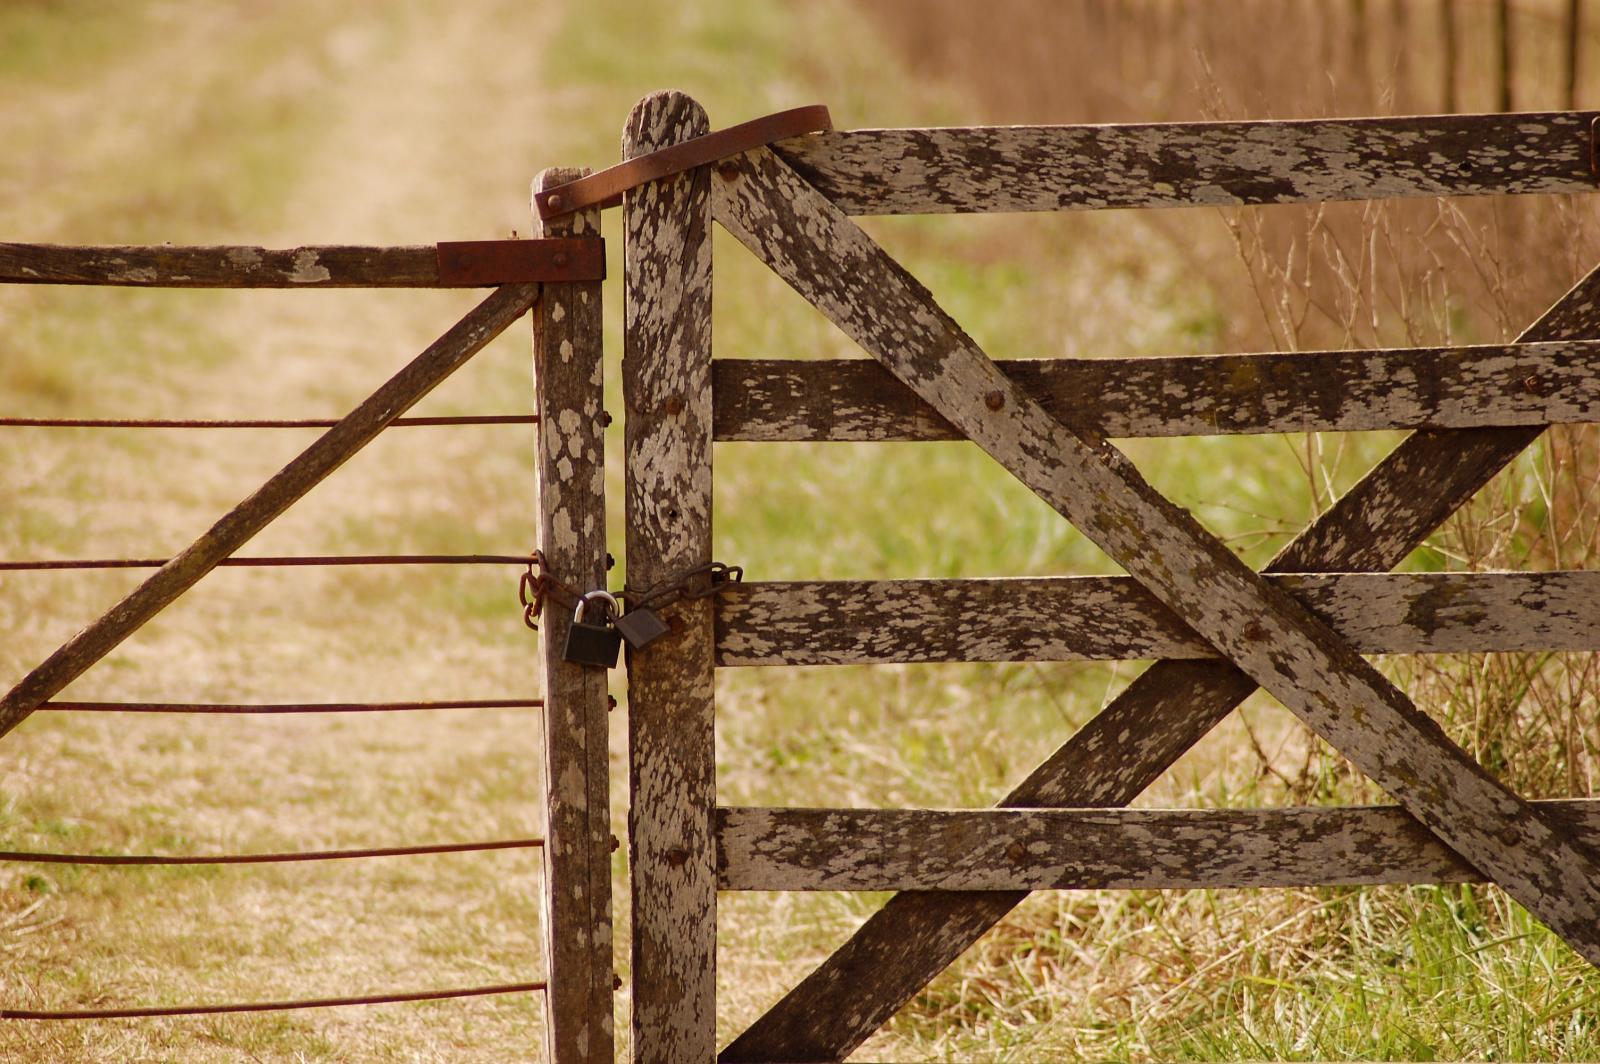 Farm gate. Photo credit: Pexels